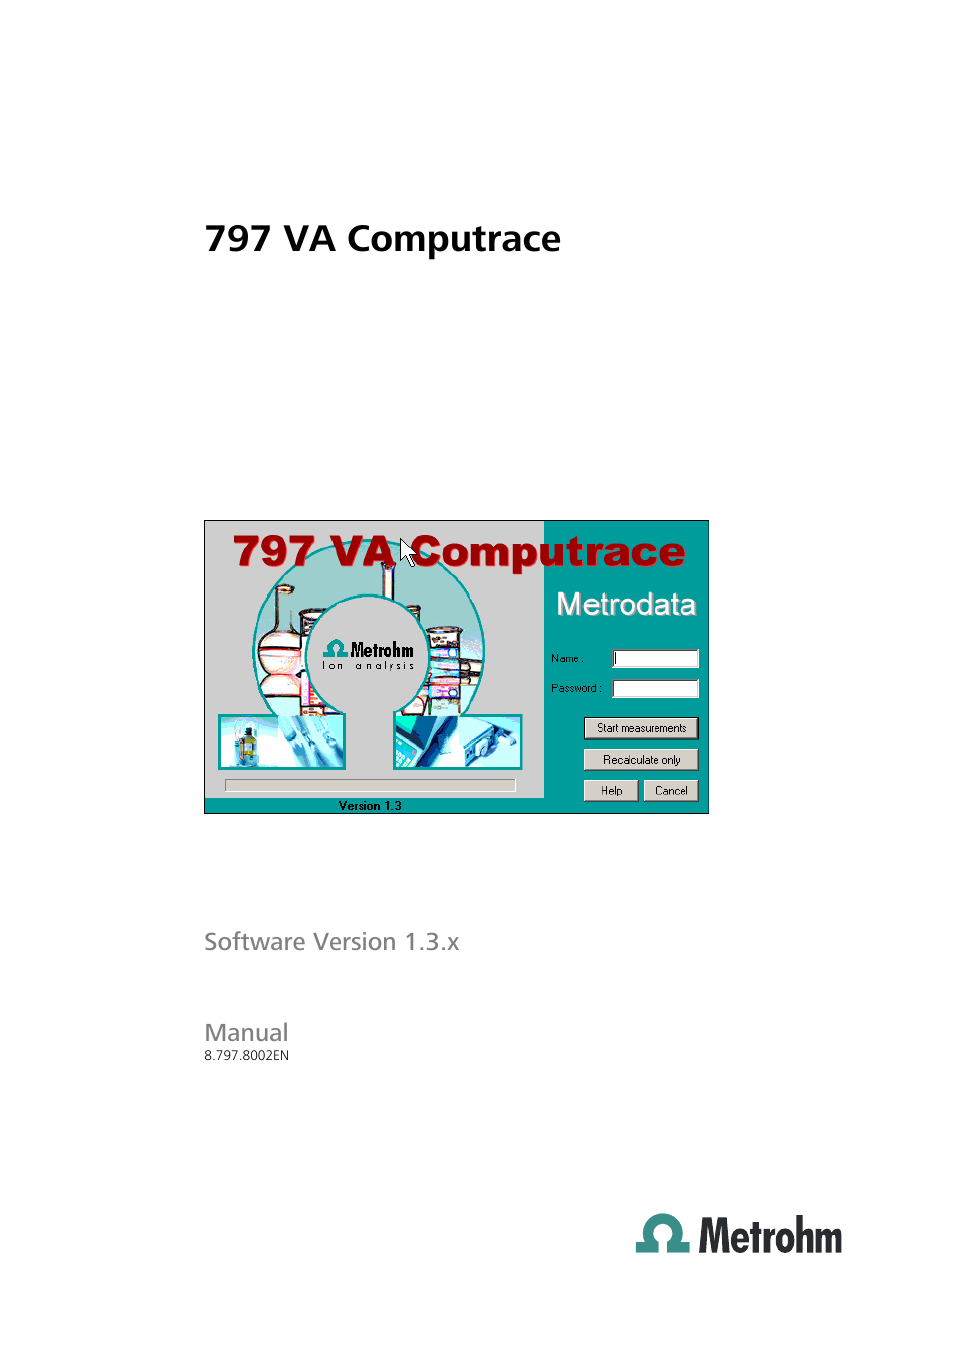 metrohm 797 va computrace user manual 295 pages